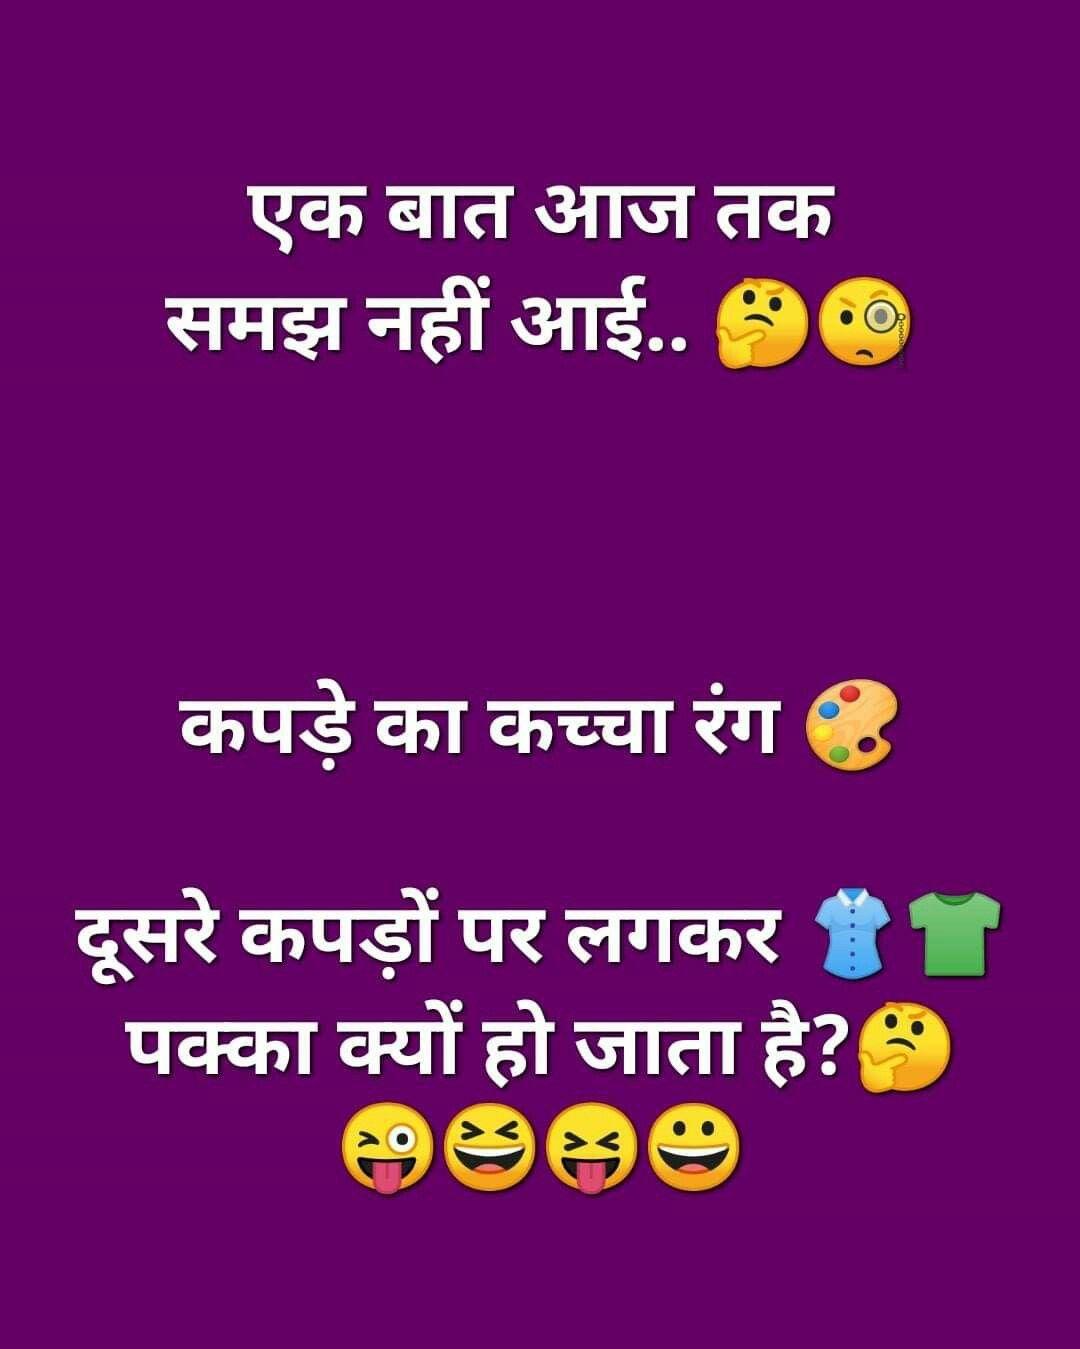 Pin by Narindar Naswa on Hanso Yaar, Hanso. | Funny jokes ...